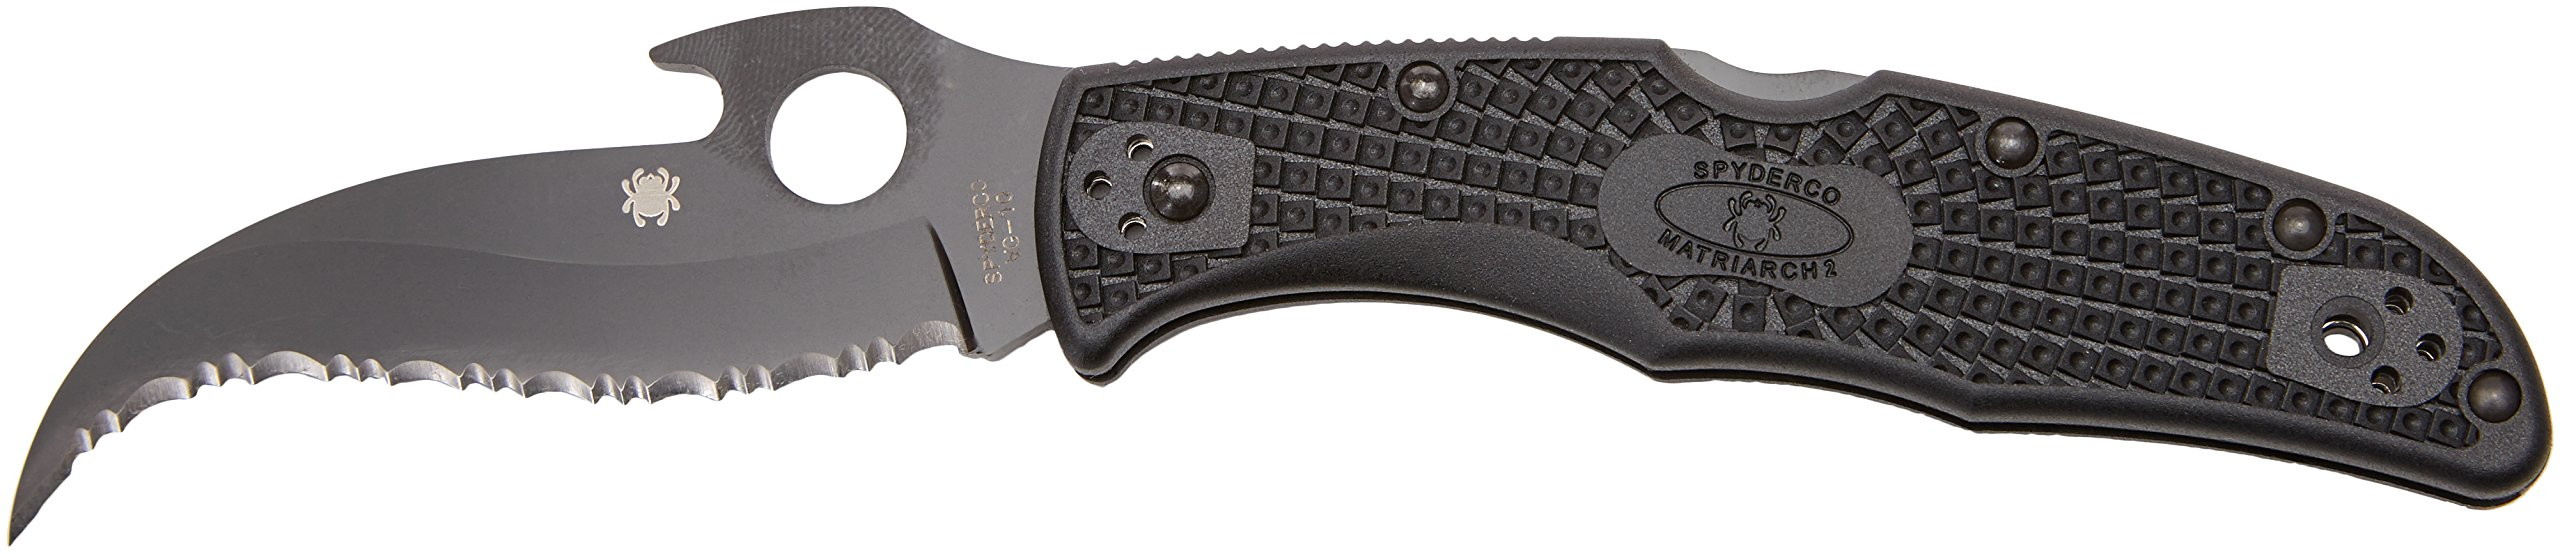 Spyderco C12SBBK2W Matriarch 2 Folding Knife with Emerson Opener, Black, 3.57-Inch by Spyderco (Image #3)